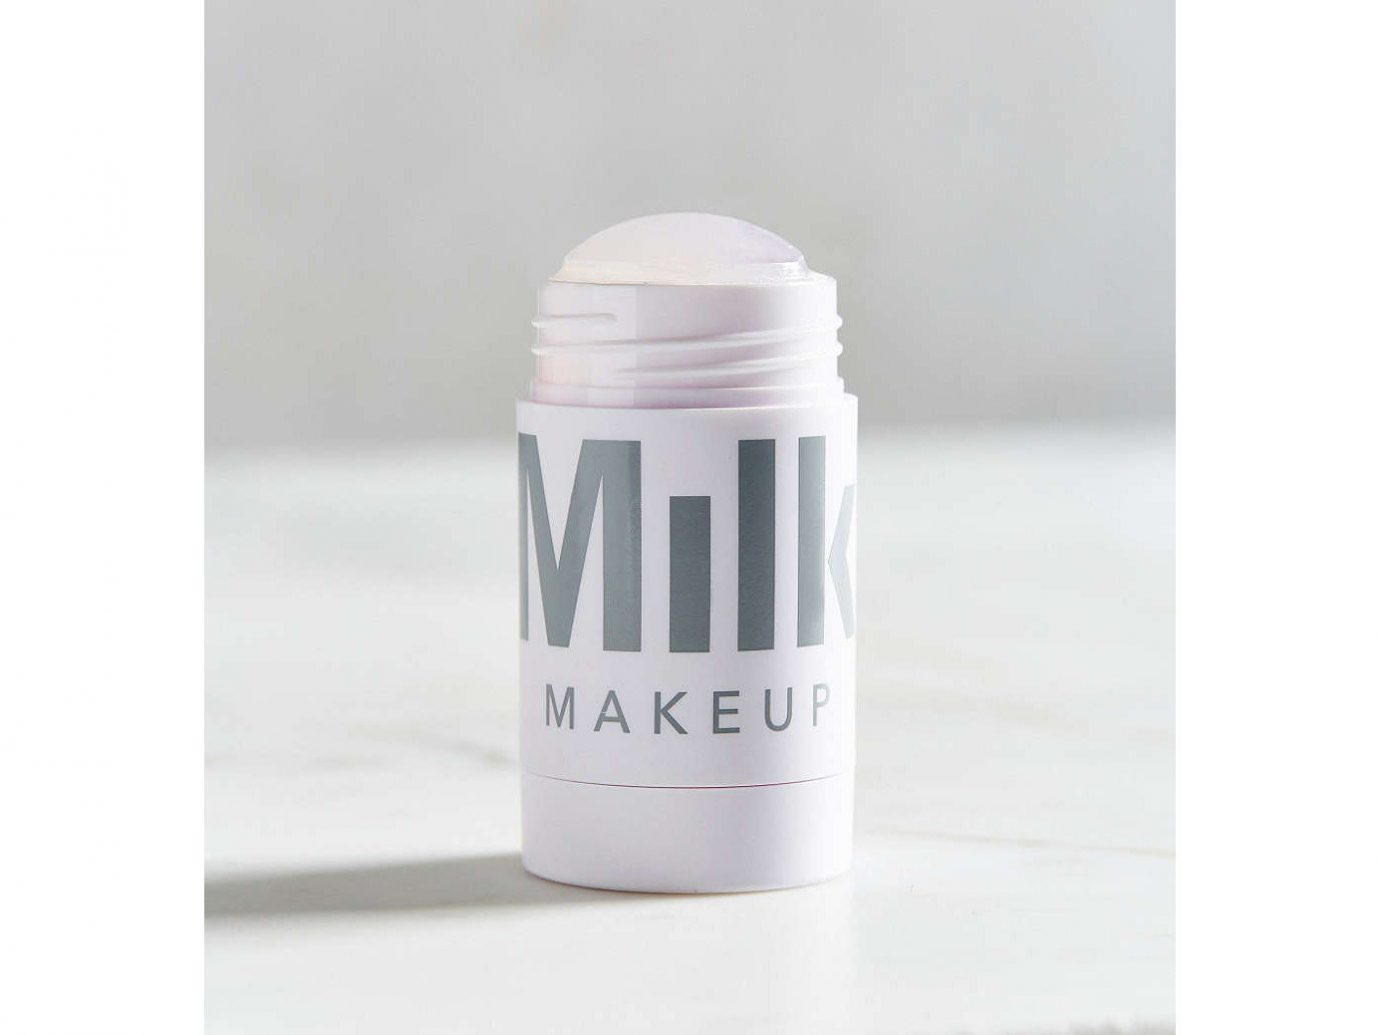 Flights Travel Shop product product design skin cream